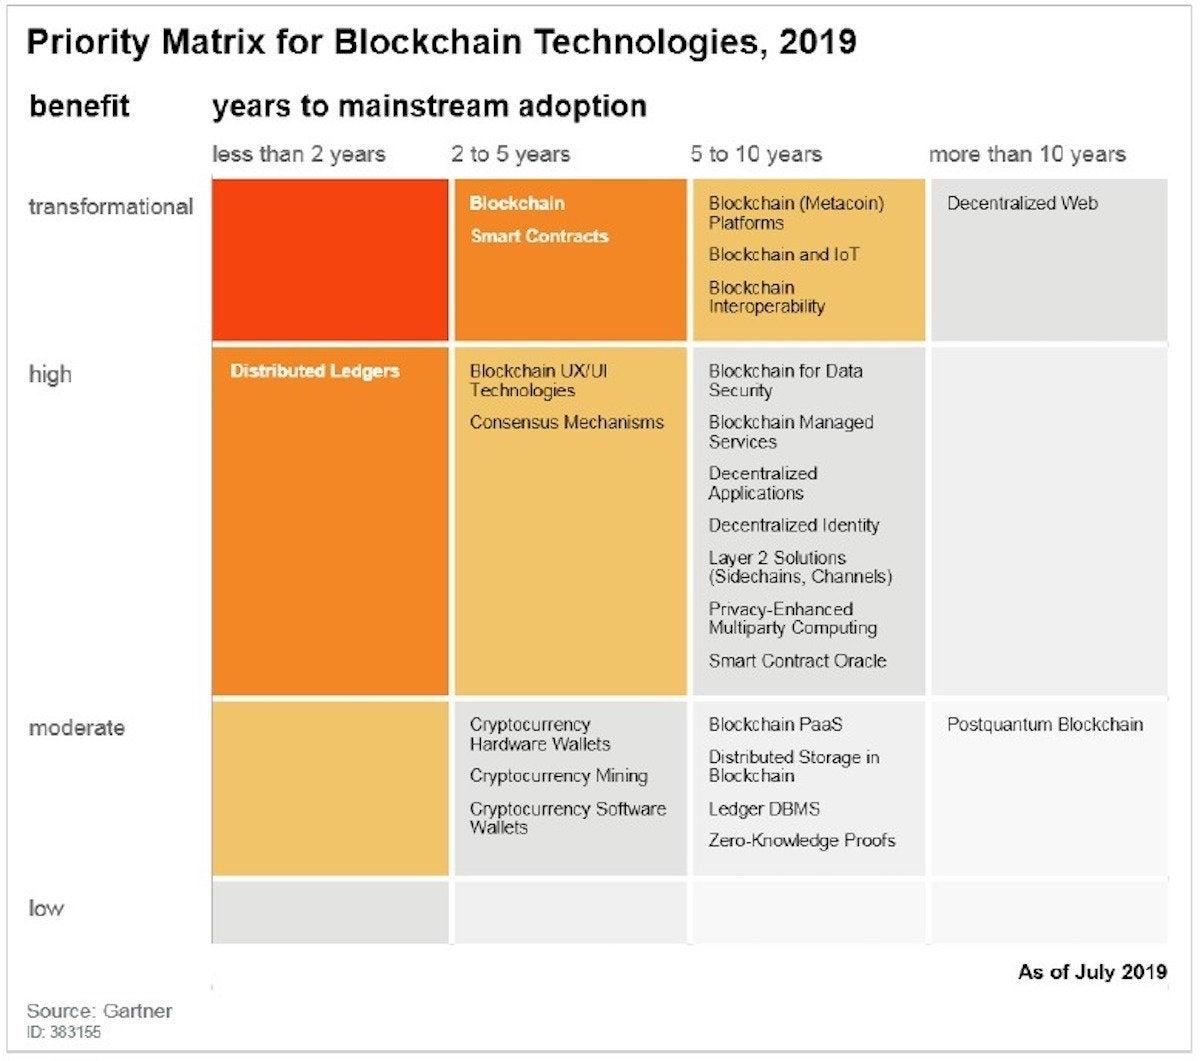 Blockchain Gartner Hype Cycle